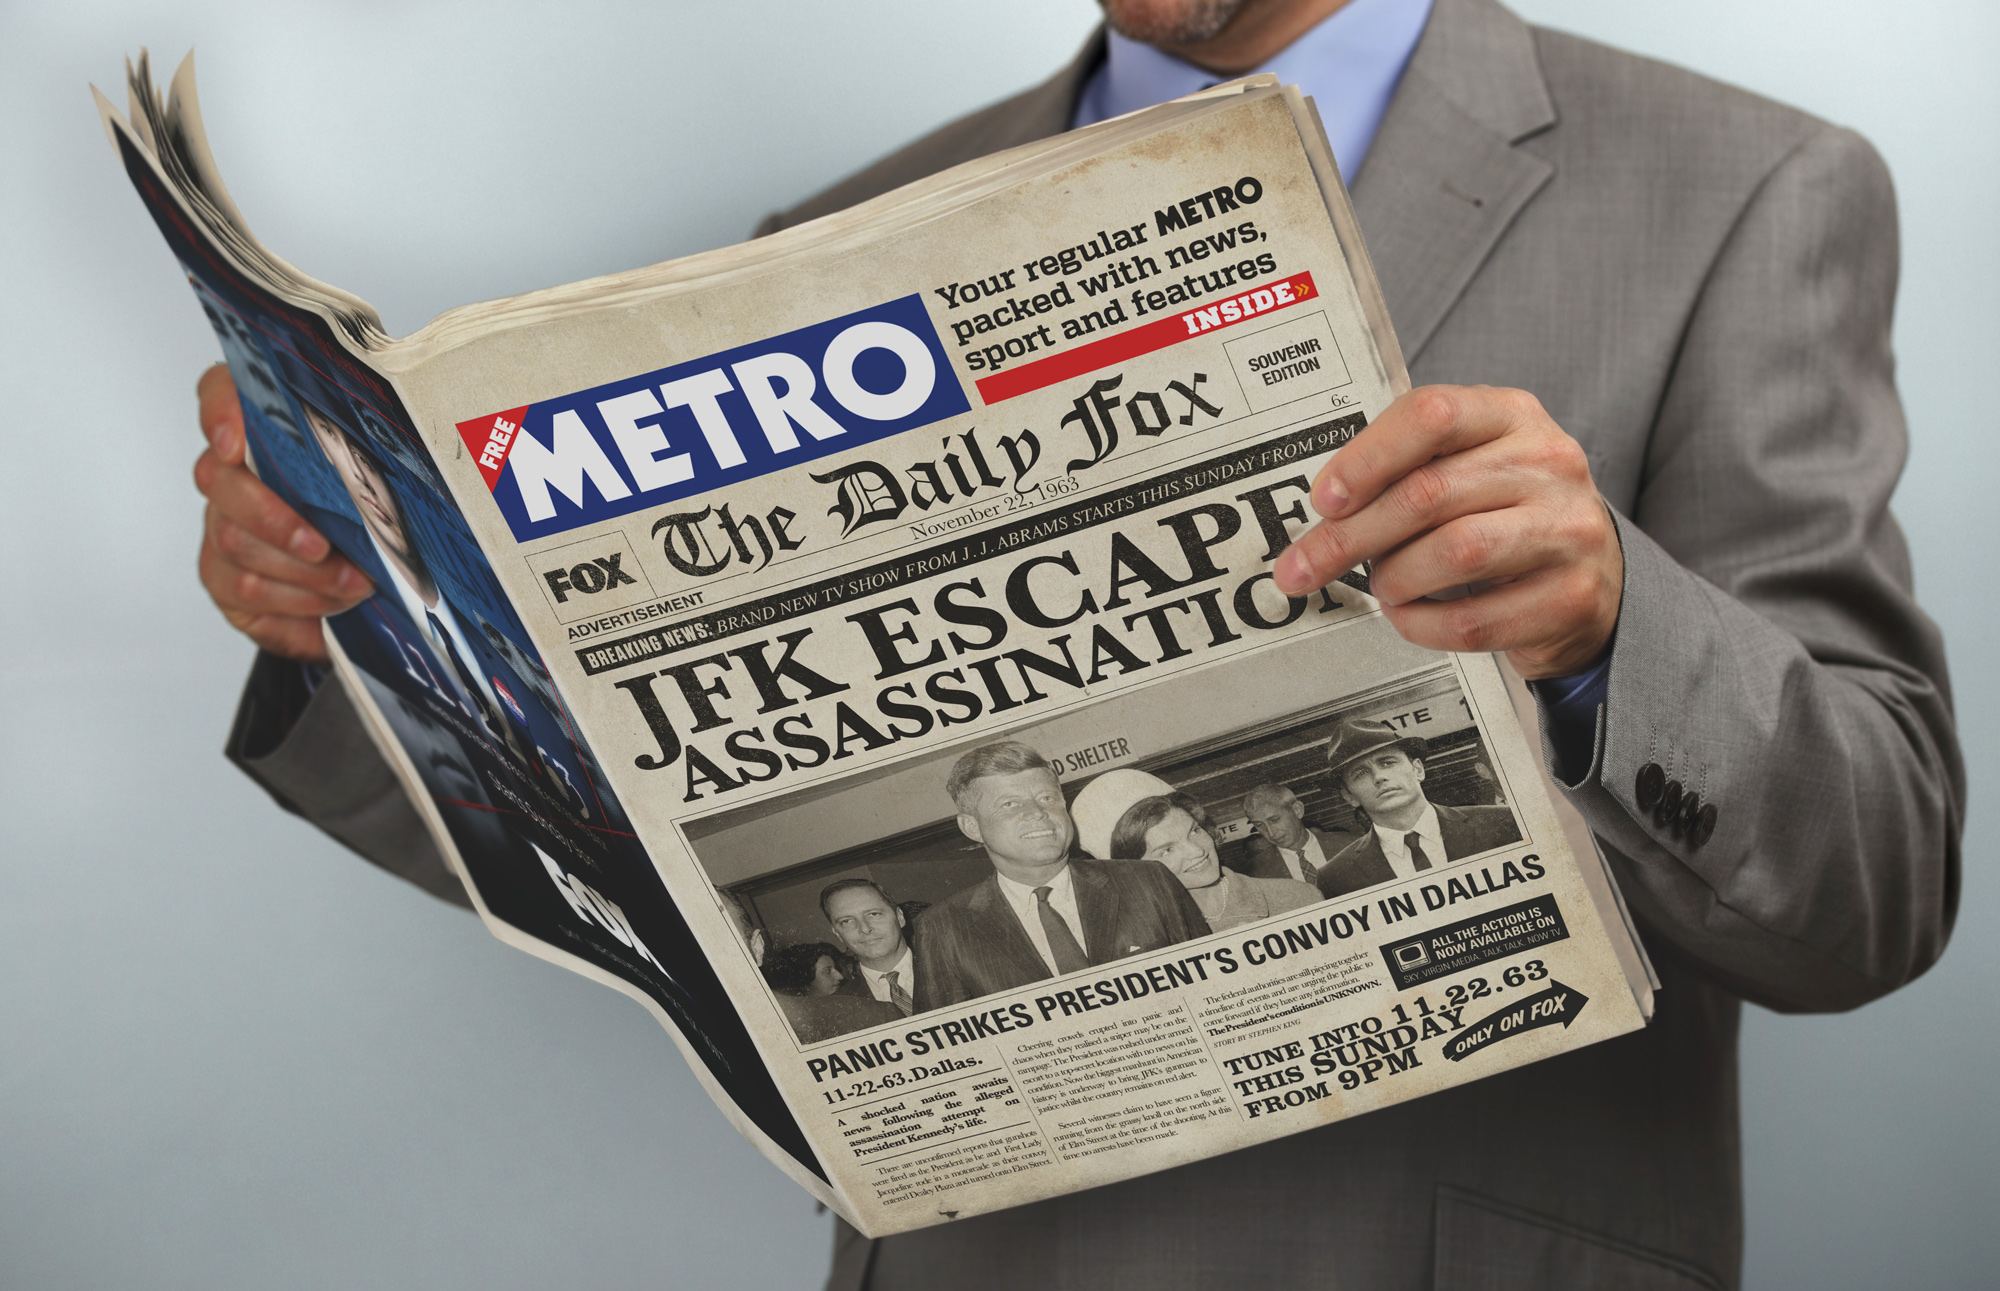 11_22_63_newspaper-metro